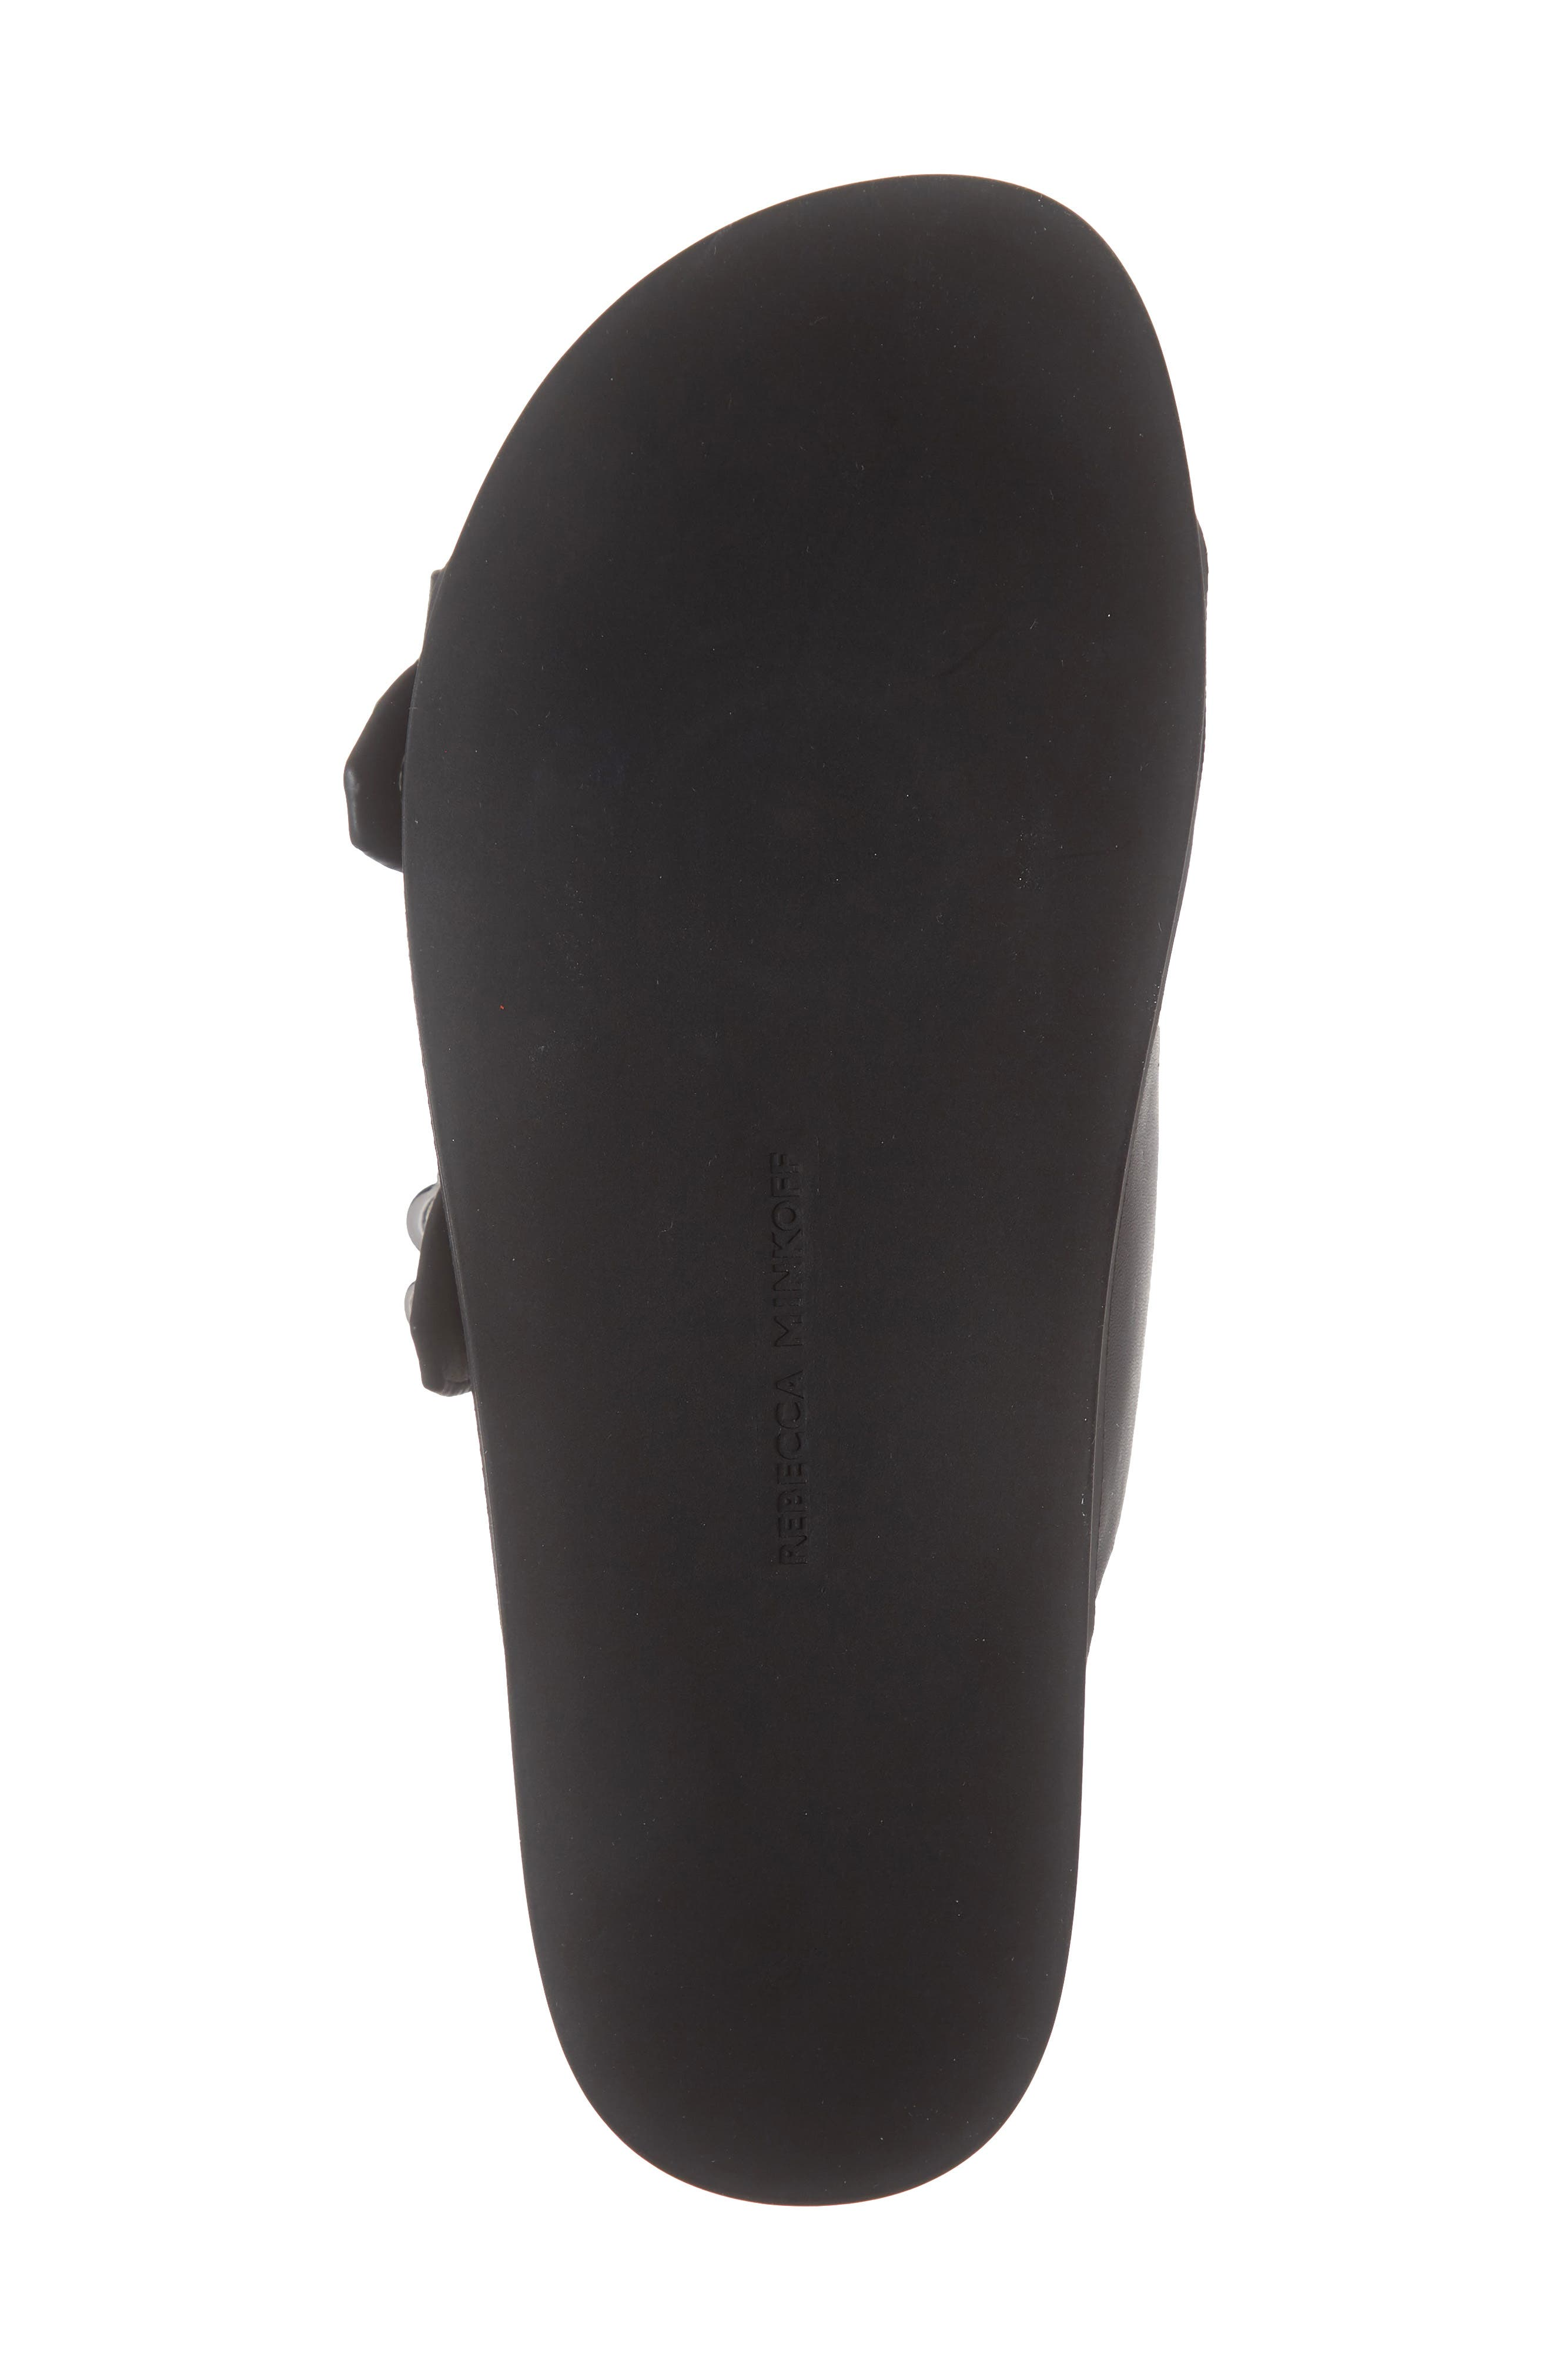 REBECCA MINKOFF, Vachel Slide Sandal, Alternate thumbnail 6, color, BLACK LEATHER